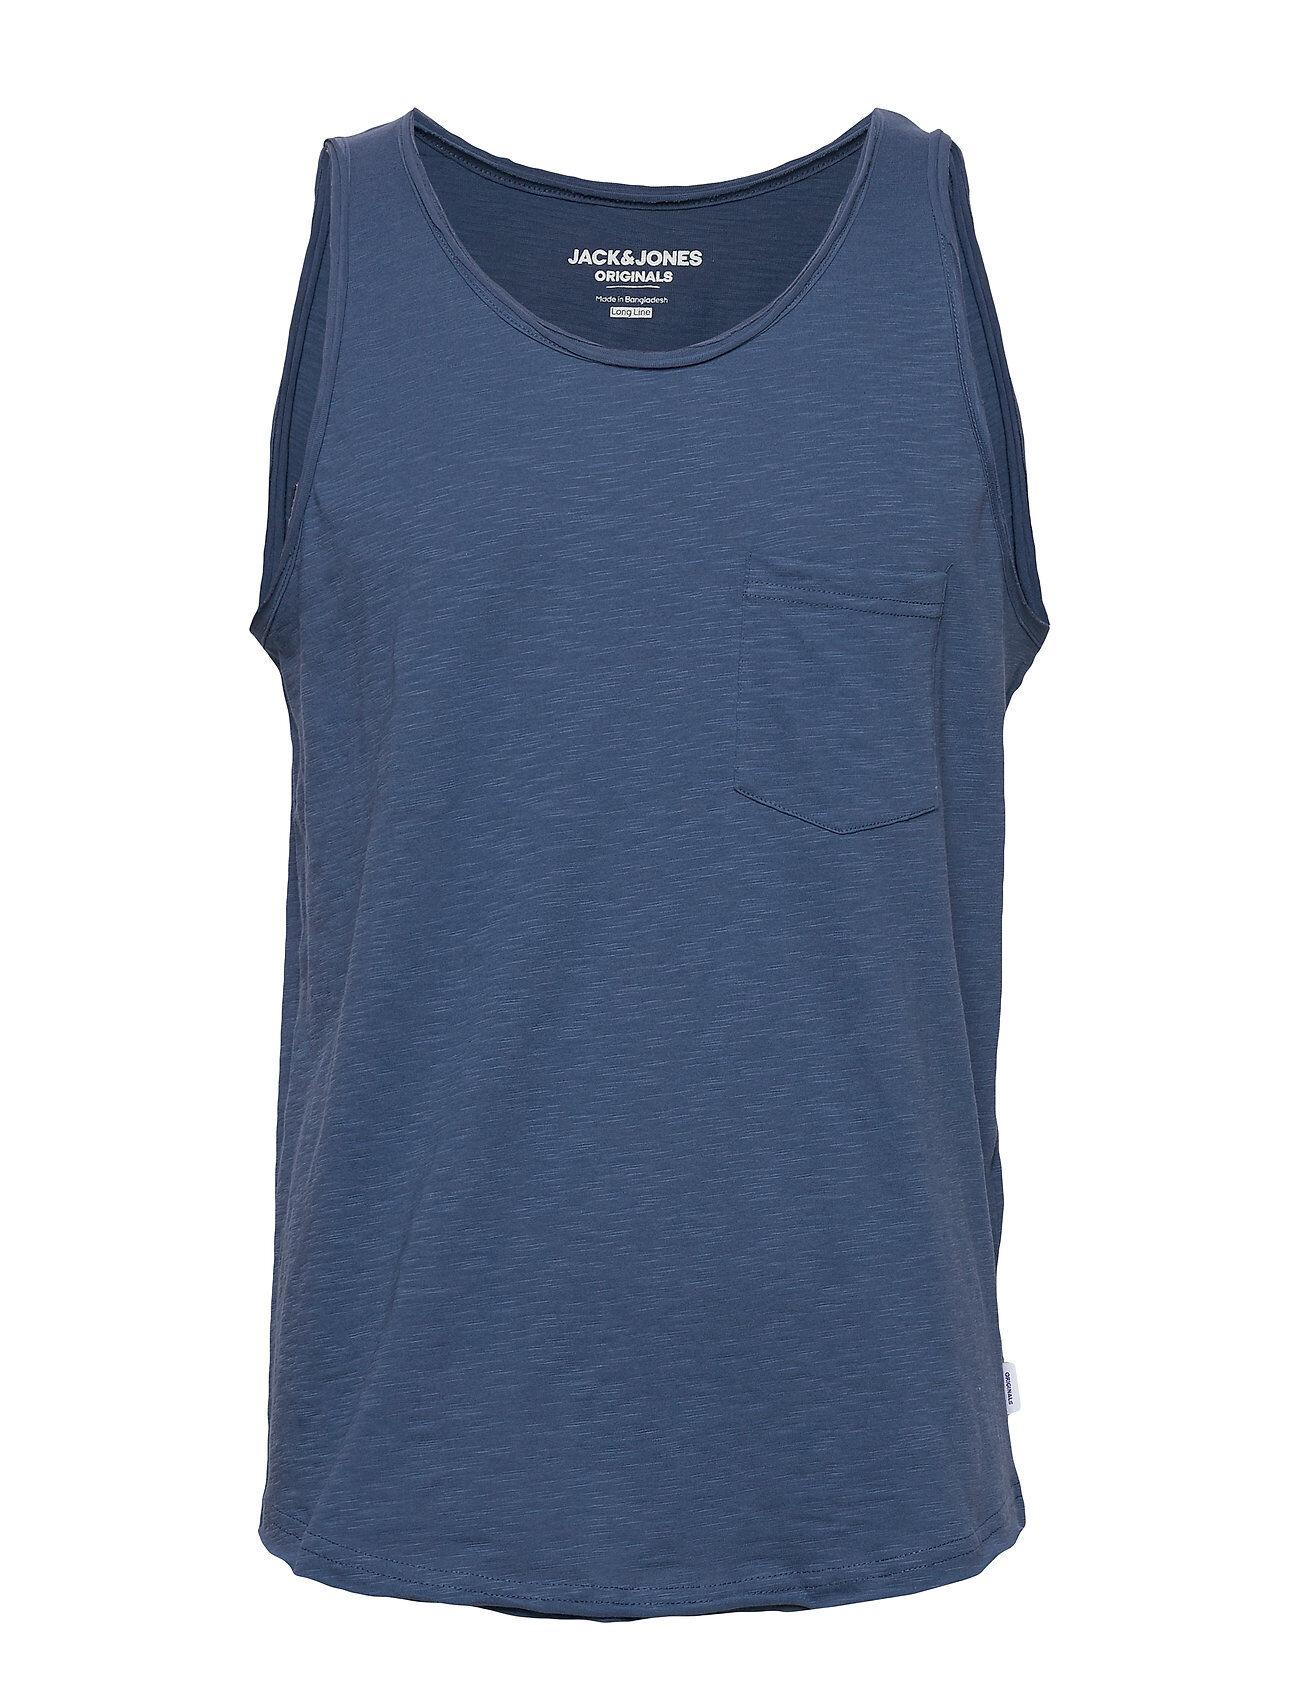 Jack & Jones Jorwallet Tank Top Sts T-shirts Sleeveless Sininen Jack & J S